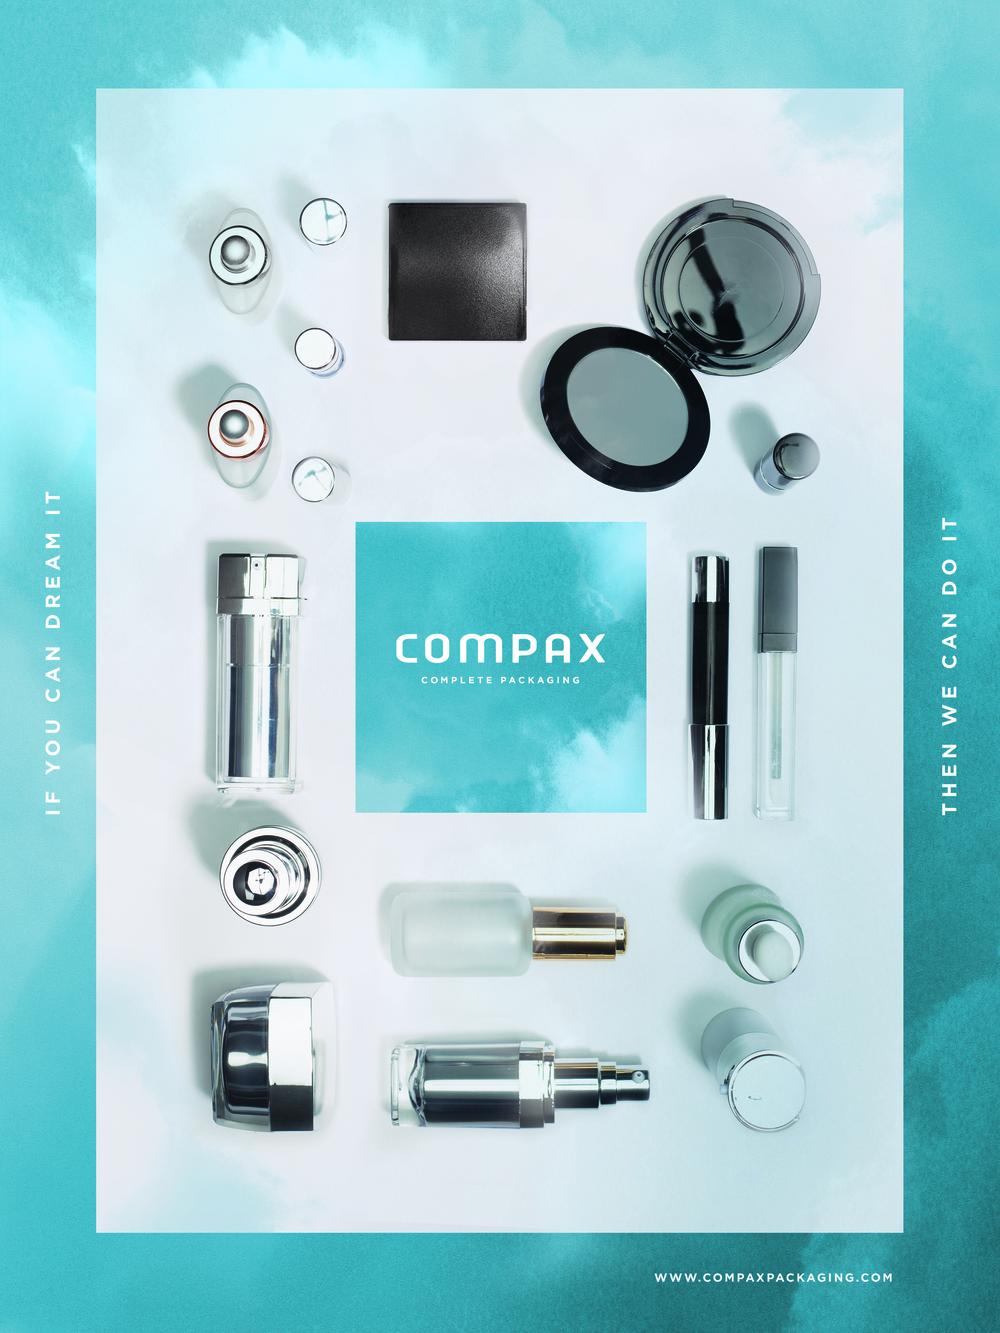 compax_concept_brandad_01a.jpg